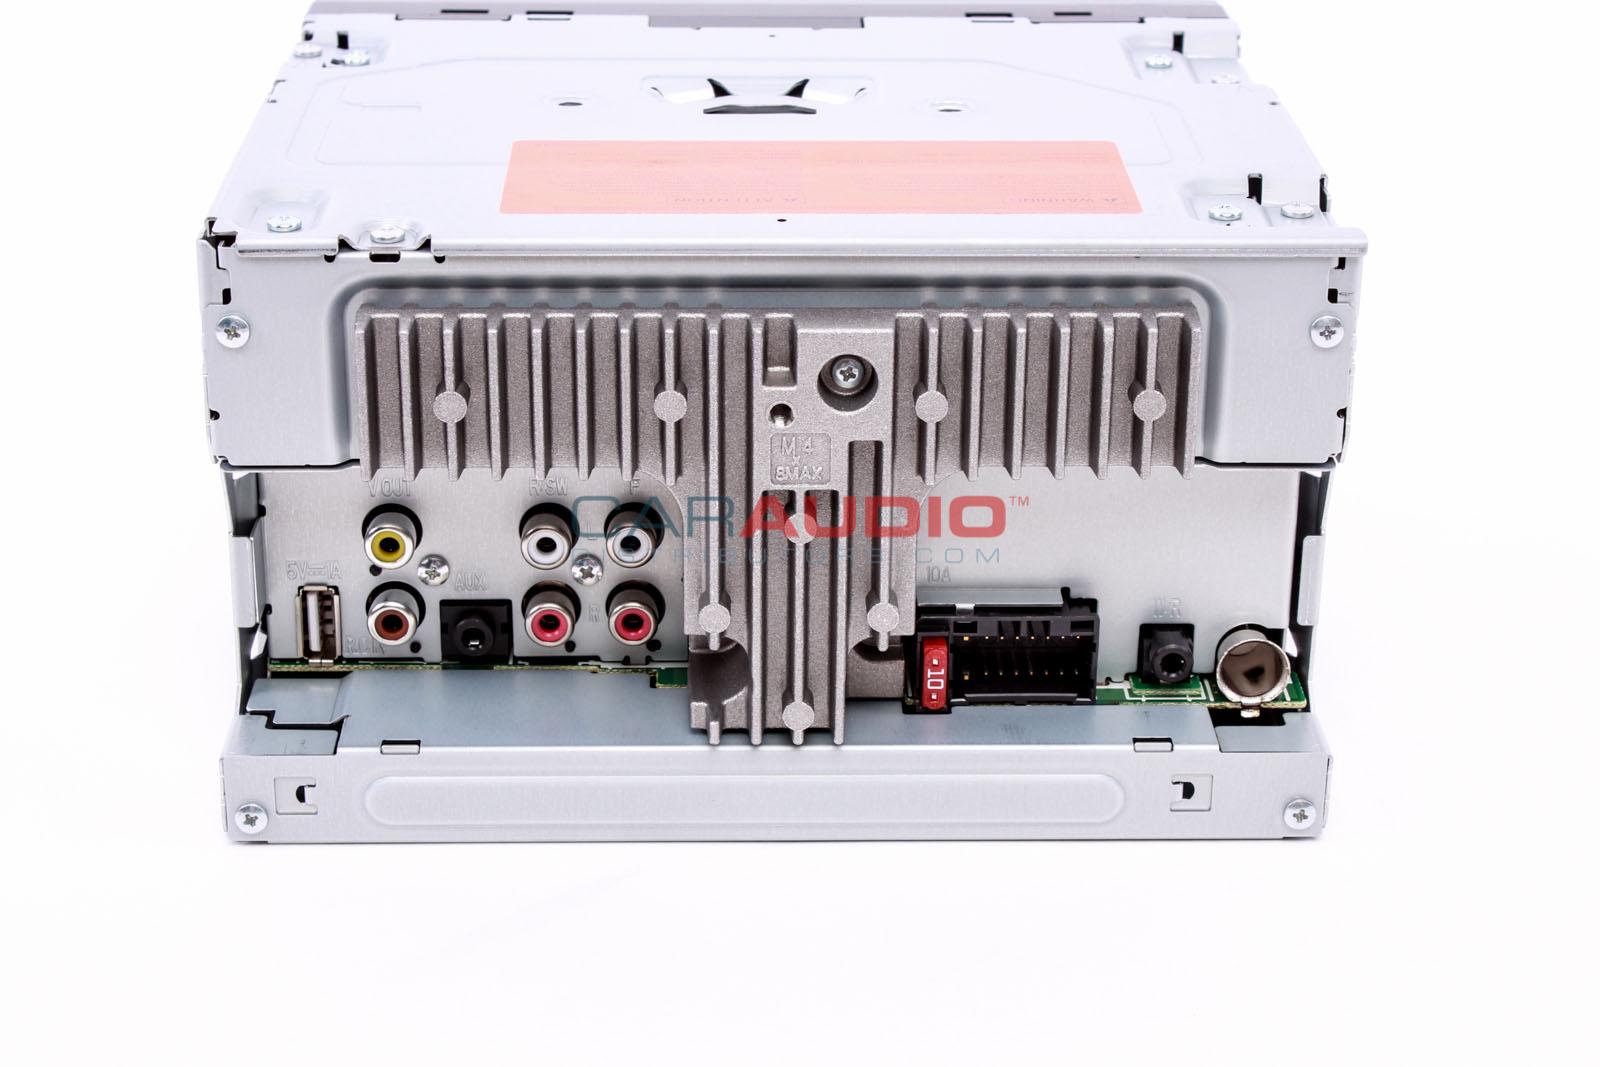 new pioneer avh 170dvd 6 2 quot din cd dvd mp3 usb aux car stereo receiver ebay